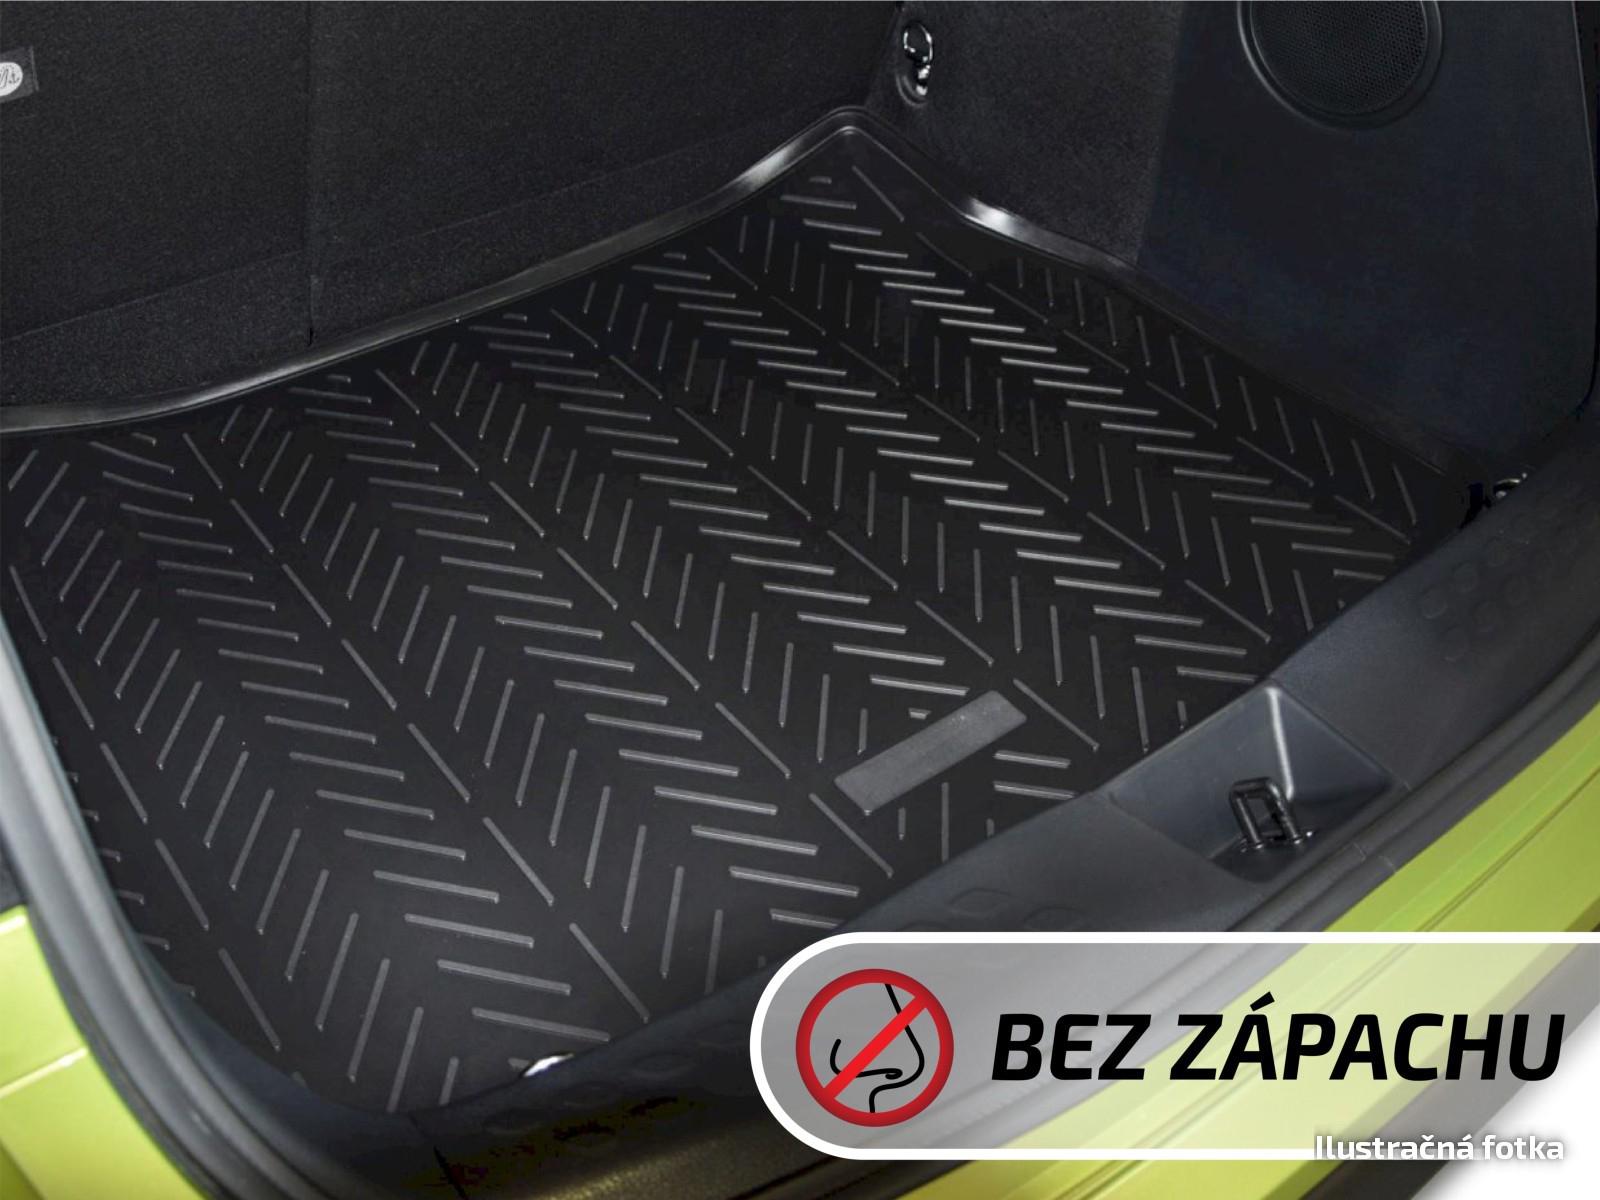 Poza cu Tavita de portbagaj Premium, Volkswagen Golf Variant, 2008-2013